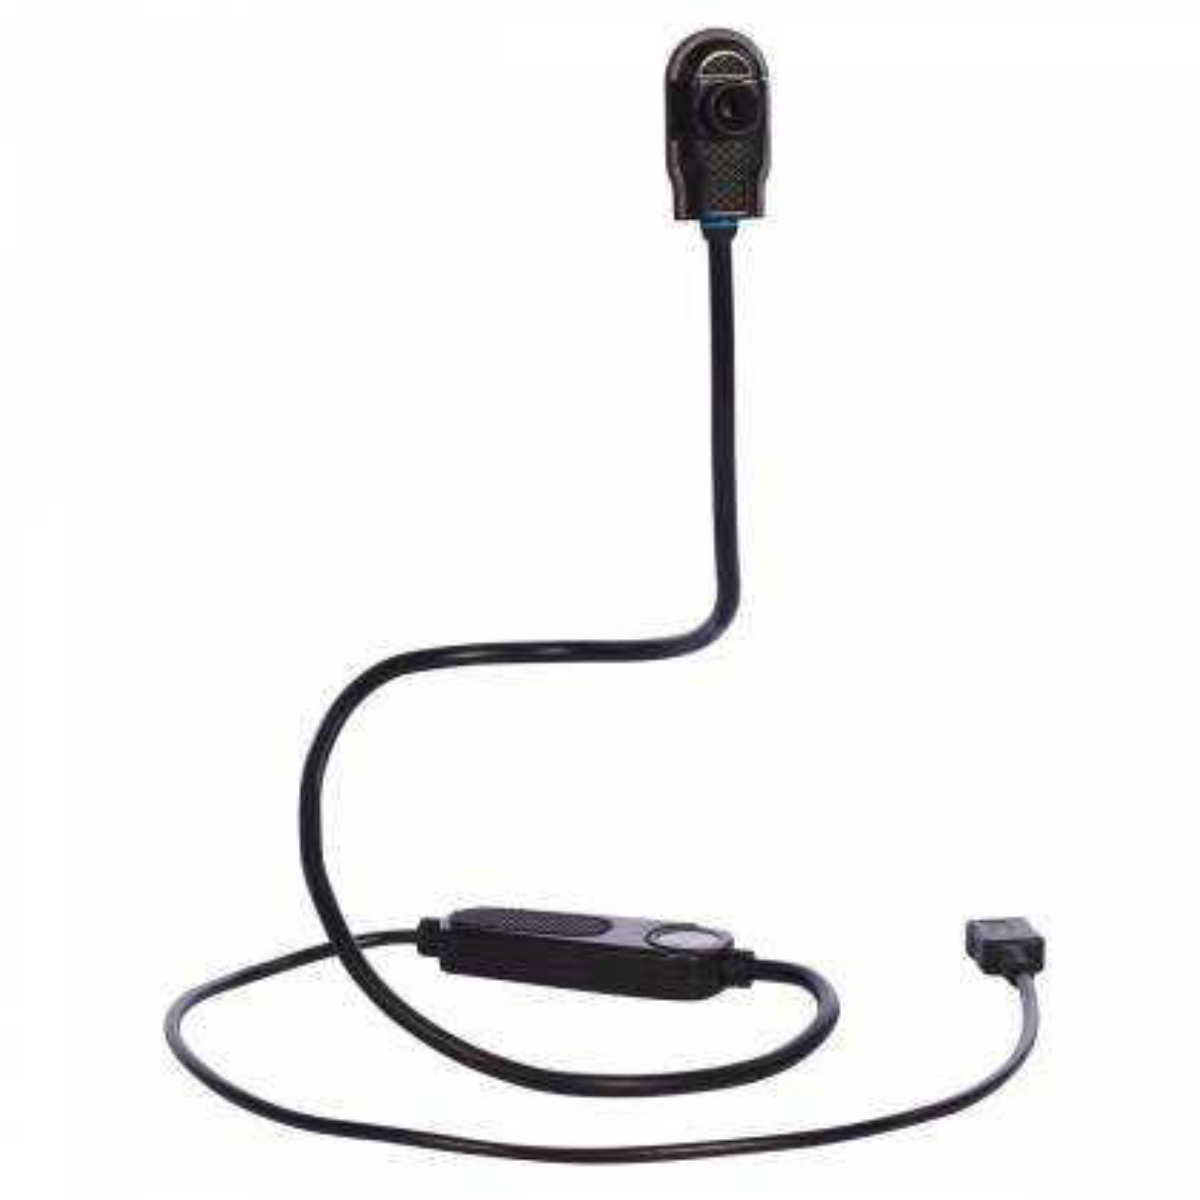 Spy Cam - Caméra Serpent - Flexible Caméra Vidéo